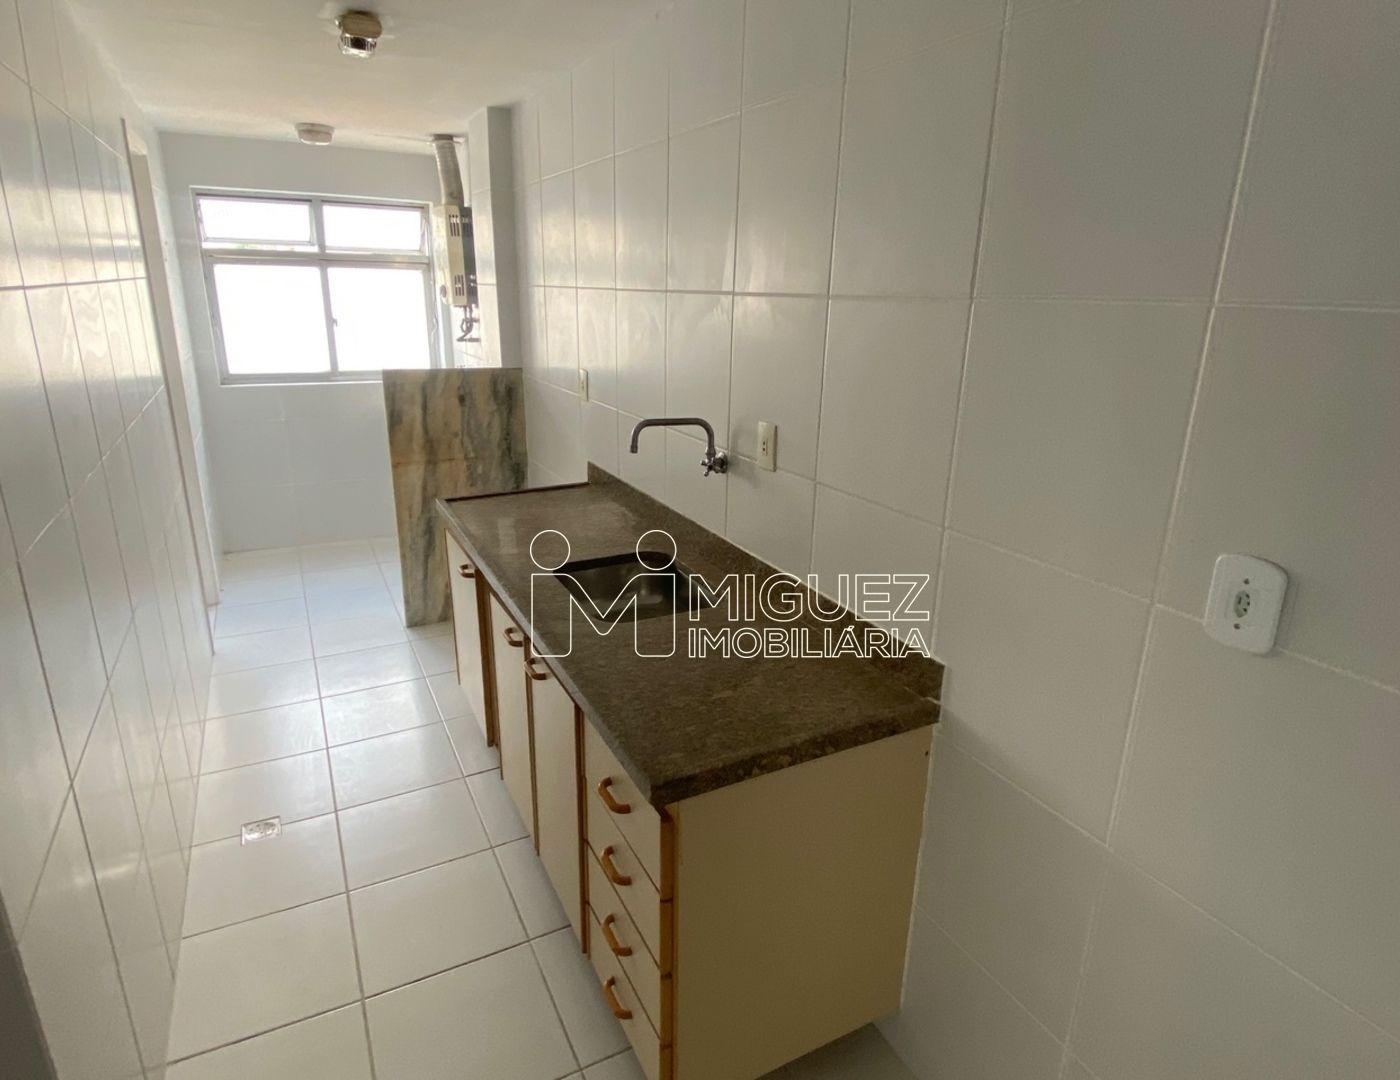 Apartamento, venda, RUA EMB RAMON CARCANO - Tijuca , Rio de janeiro